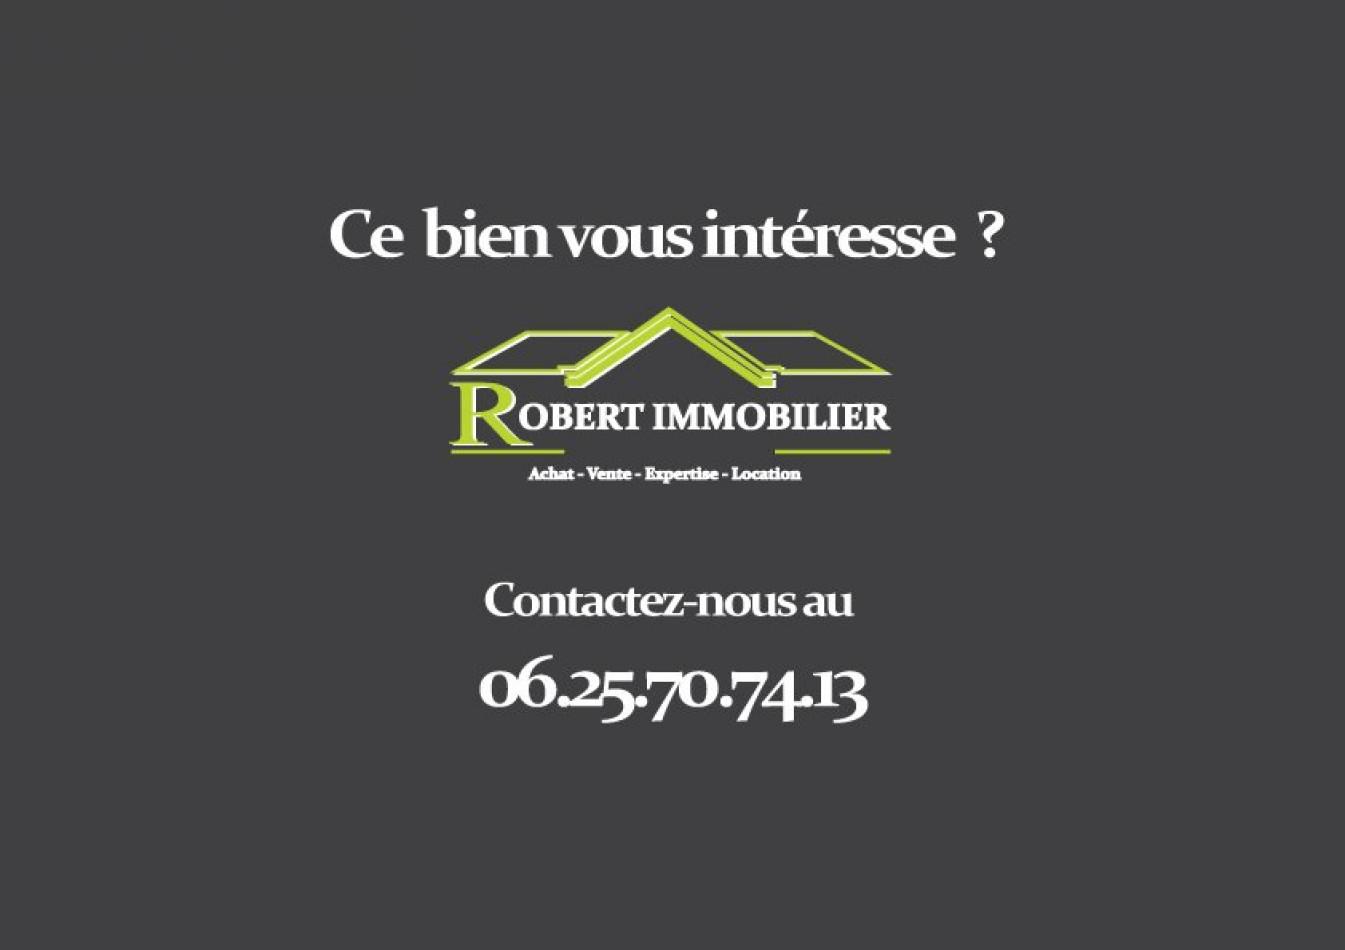 A vendre  Agde | Réf 345514399 - Robert immobilier